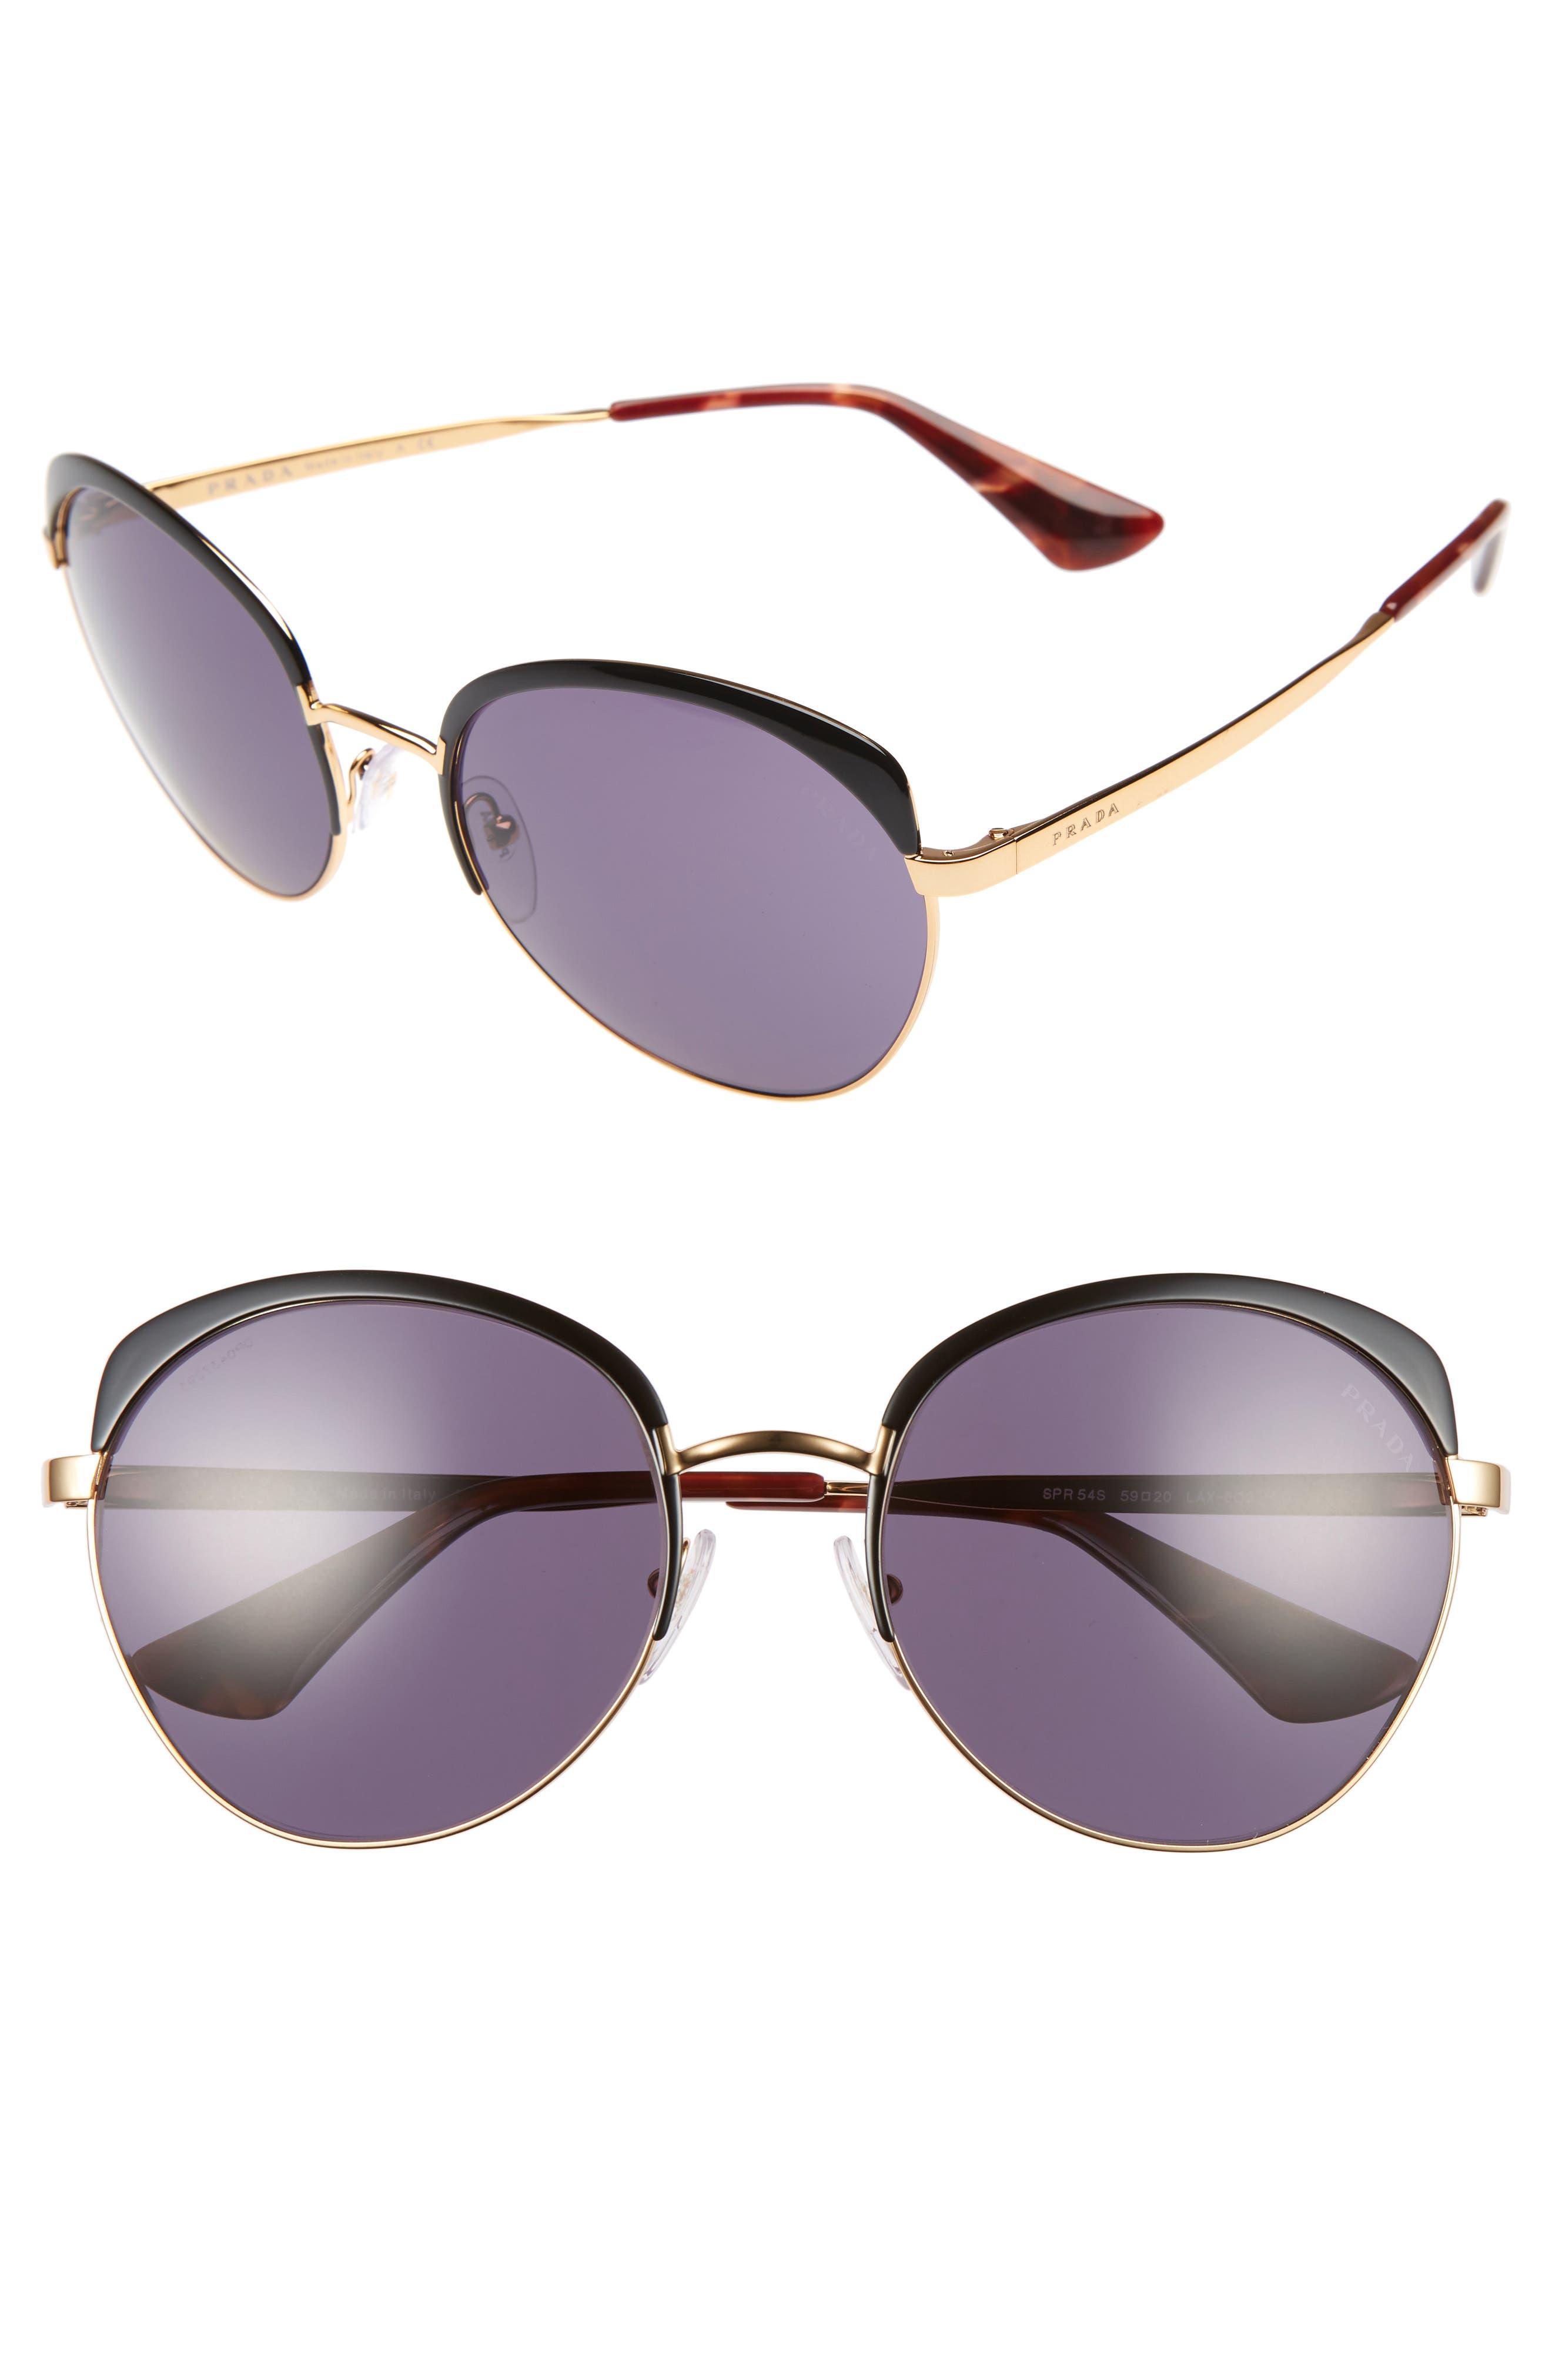 59mm Sunglasses,                         Main,                         color, Black/ Gold